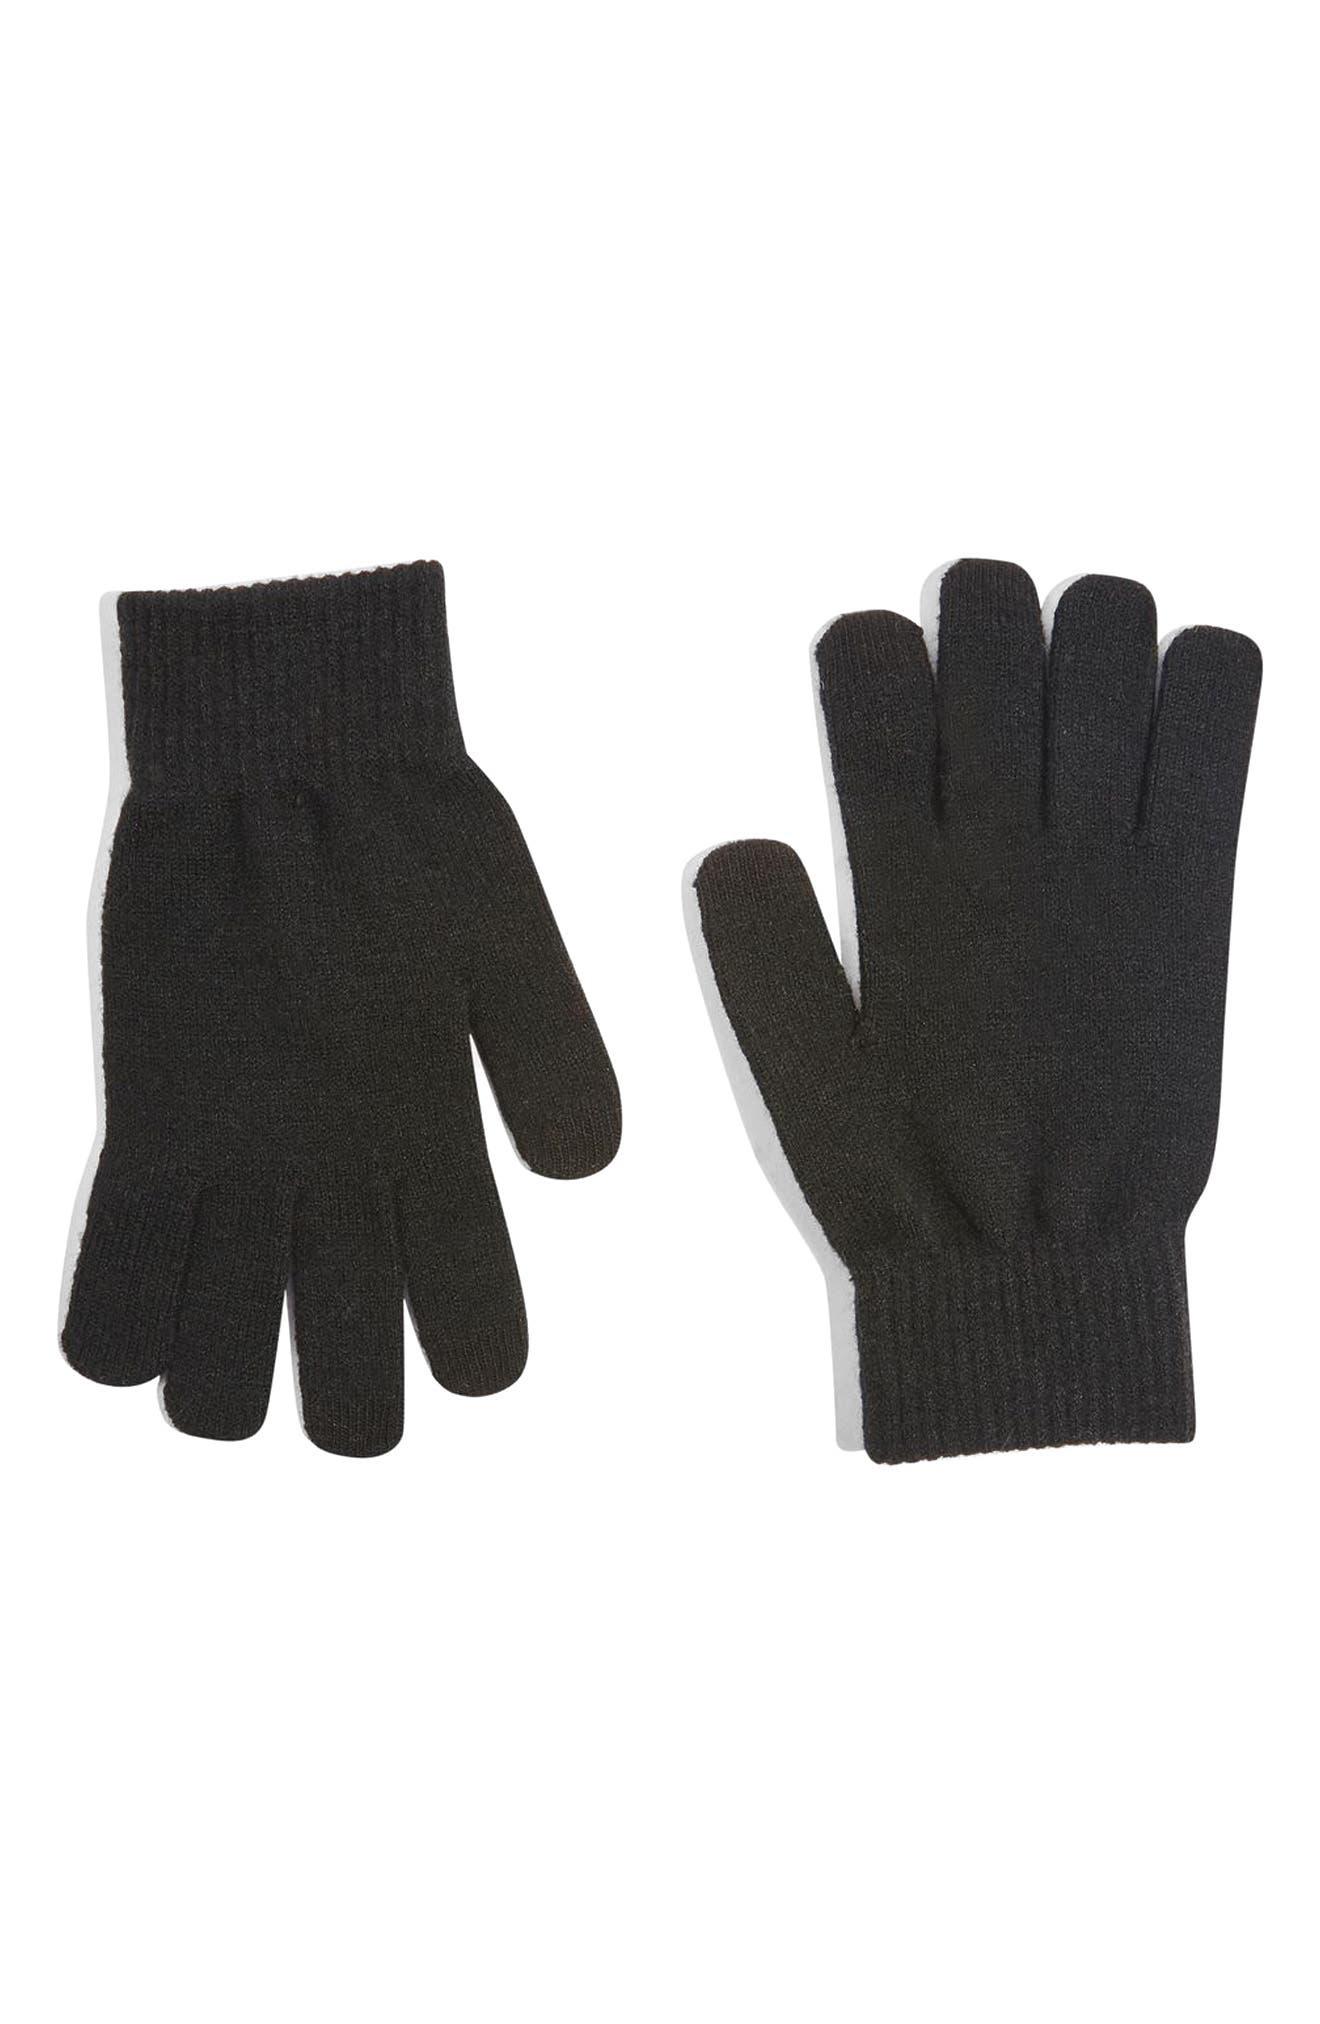 Core Winter Tech Gloves,                             Main thumbnail 1, color,                             001